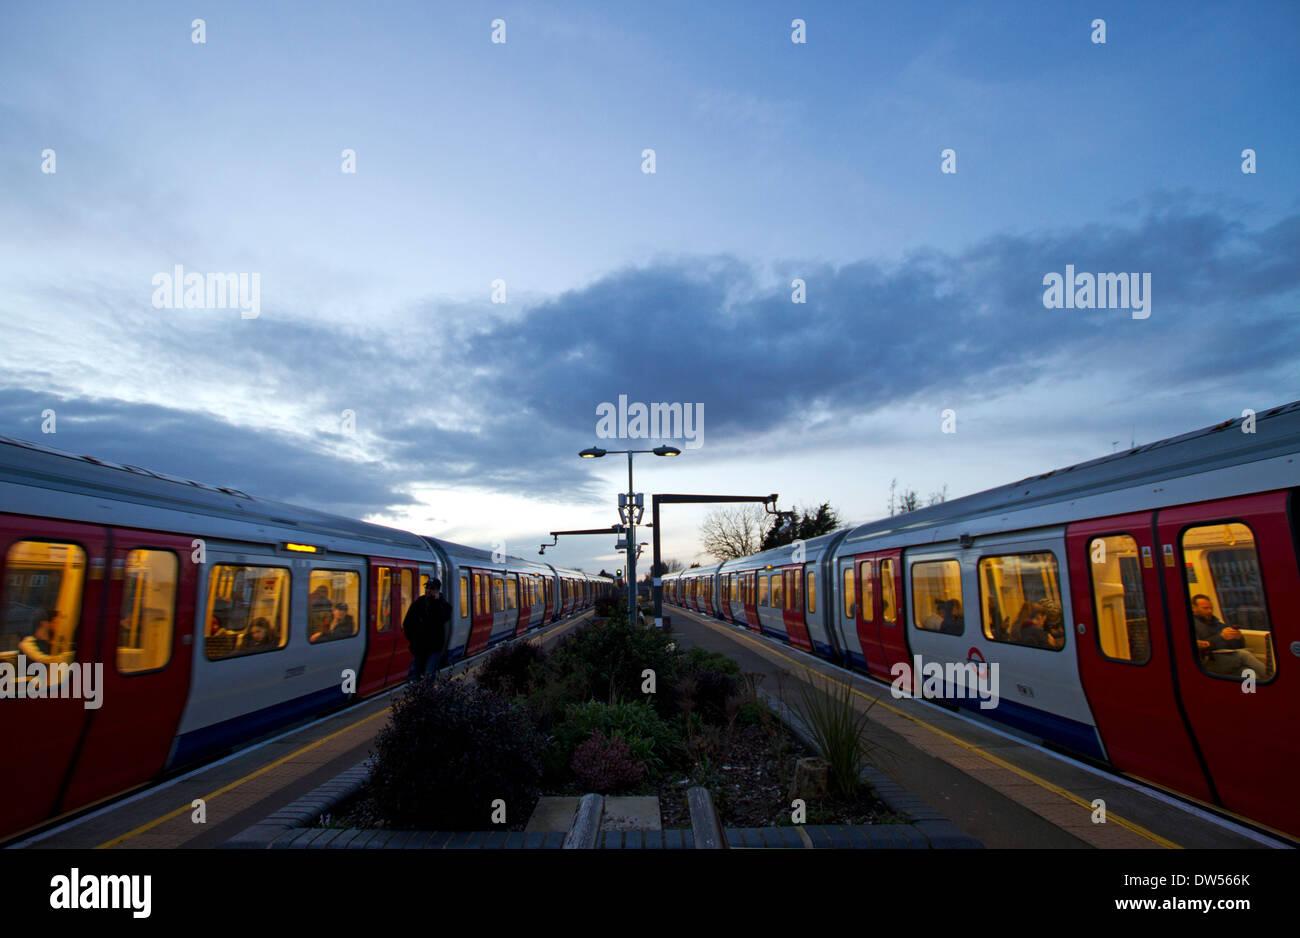 London underground trains - Stock Image